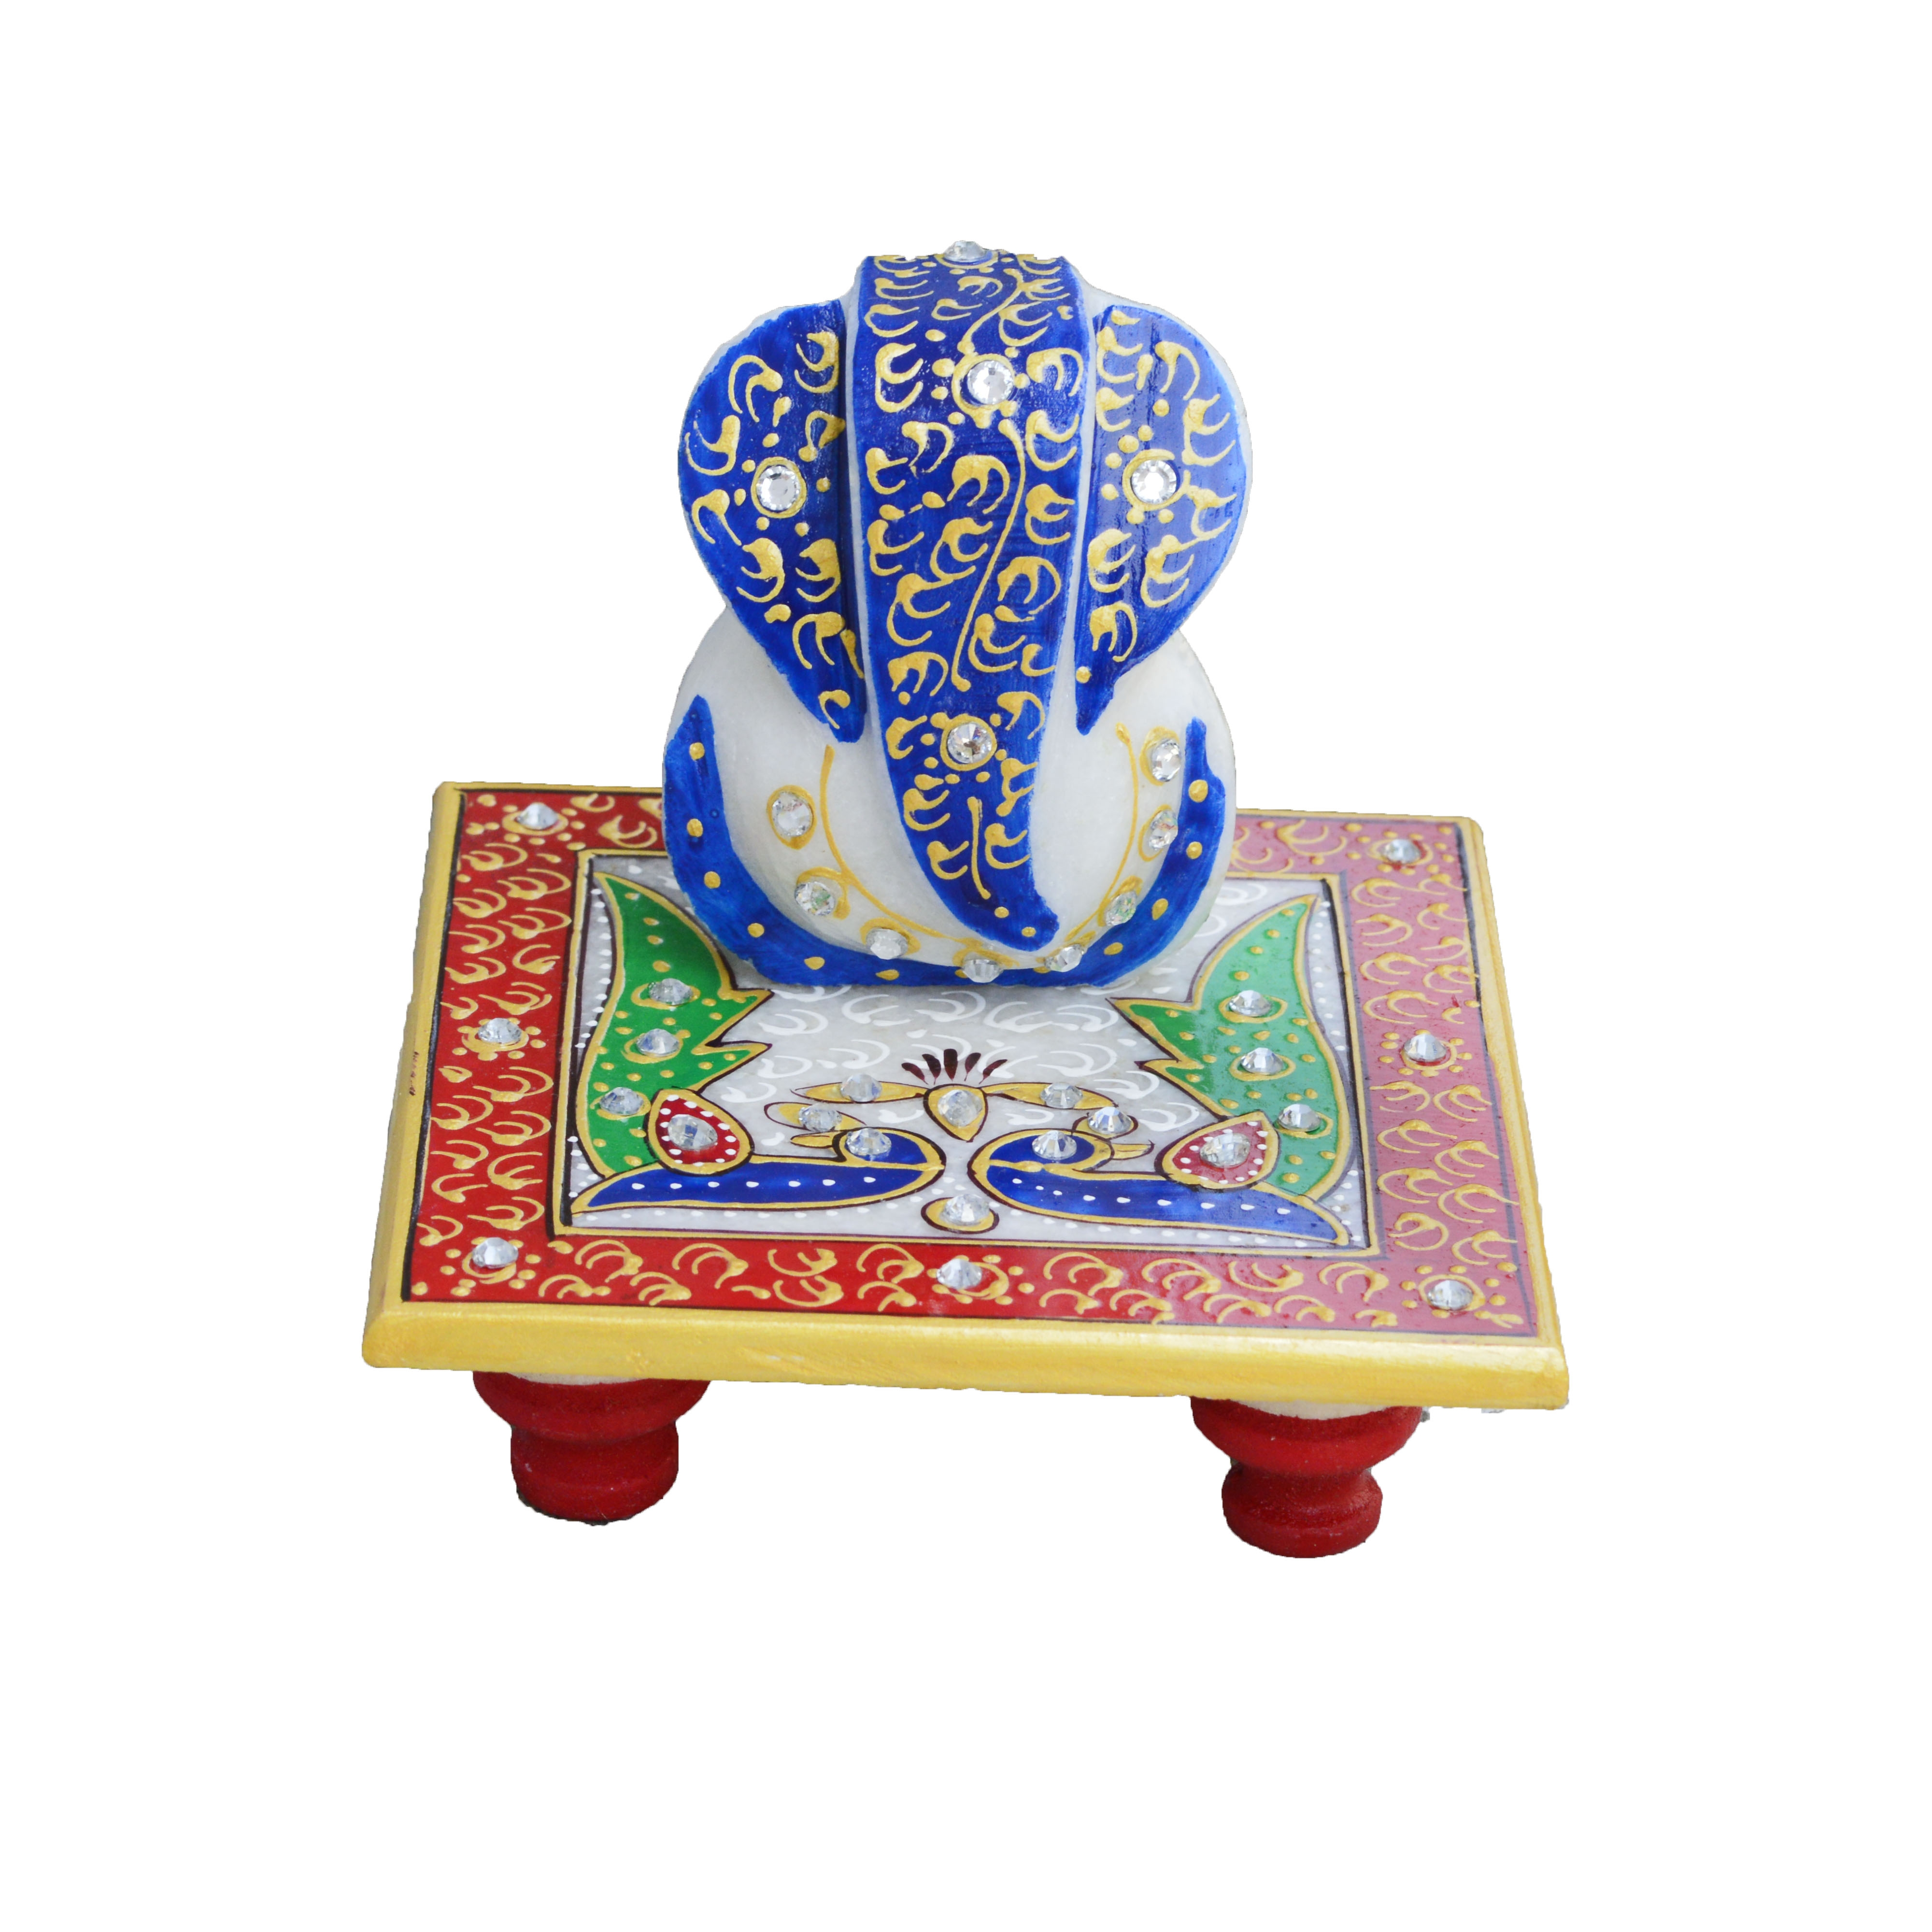 Glorious Lord Ganesha with Peocock on Marble Chowki Indian Home Decor